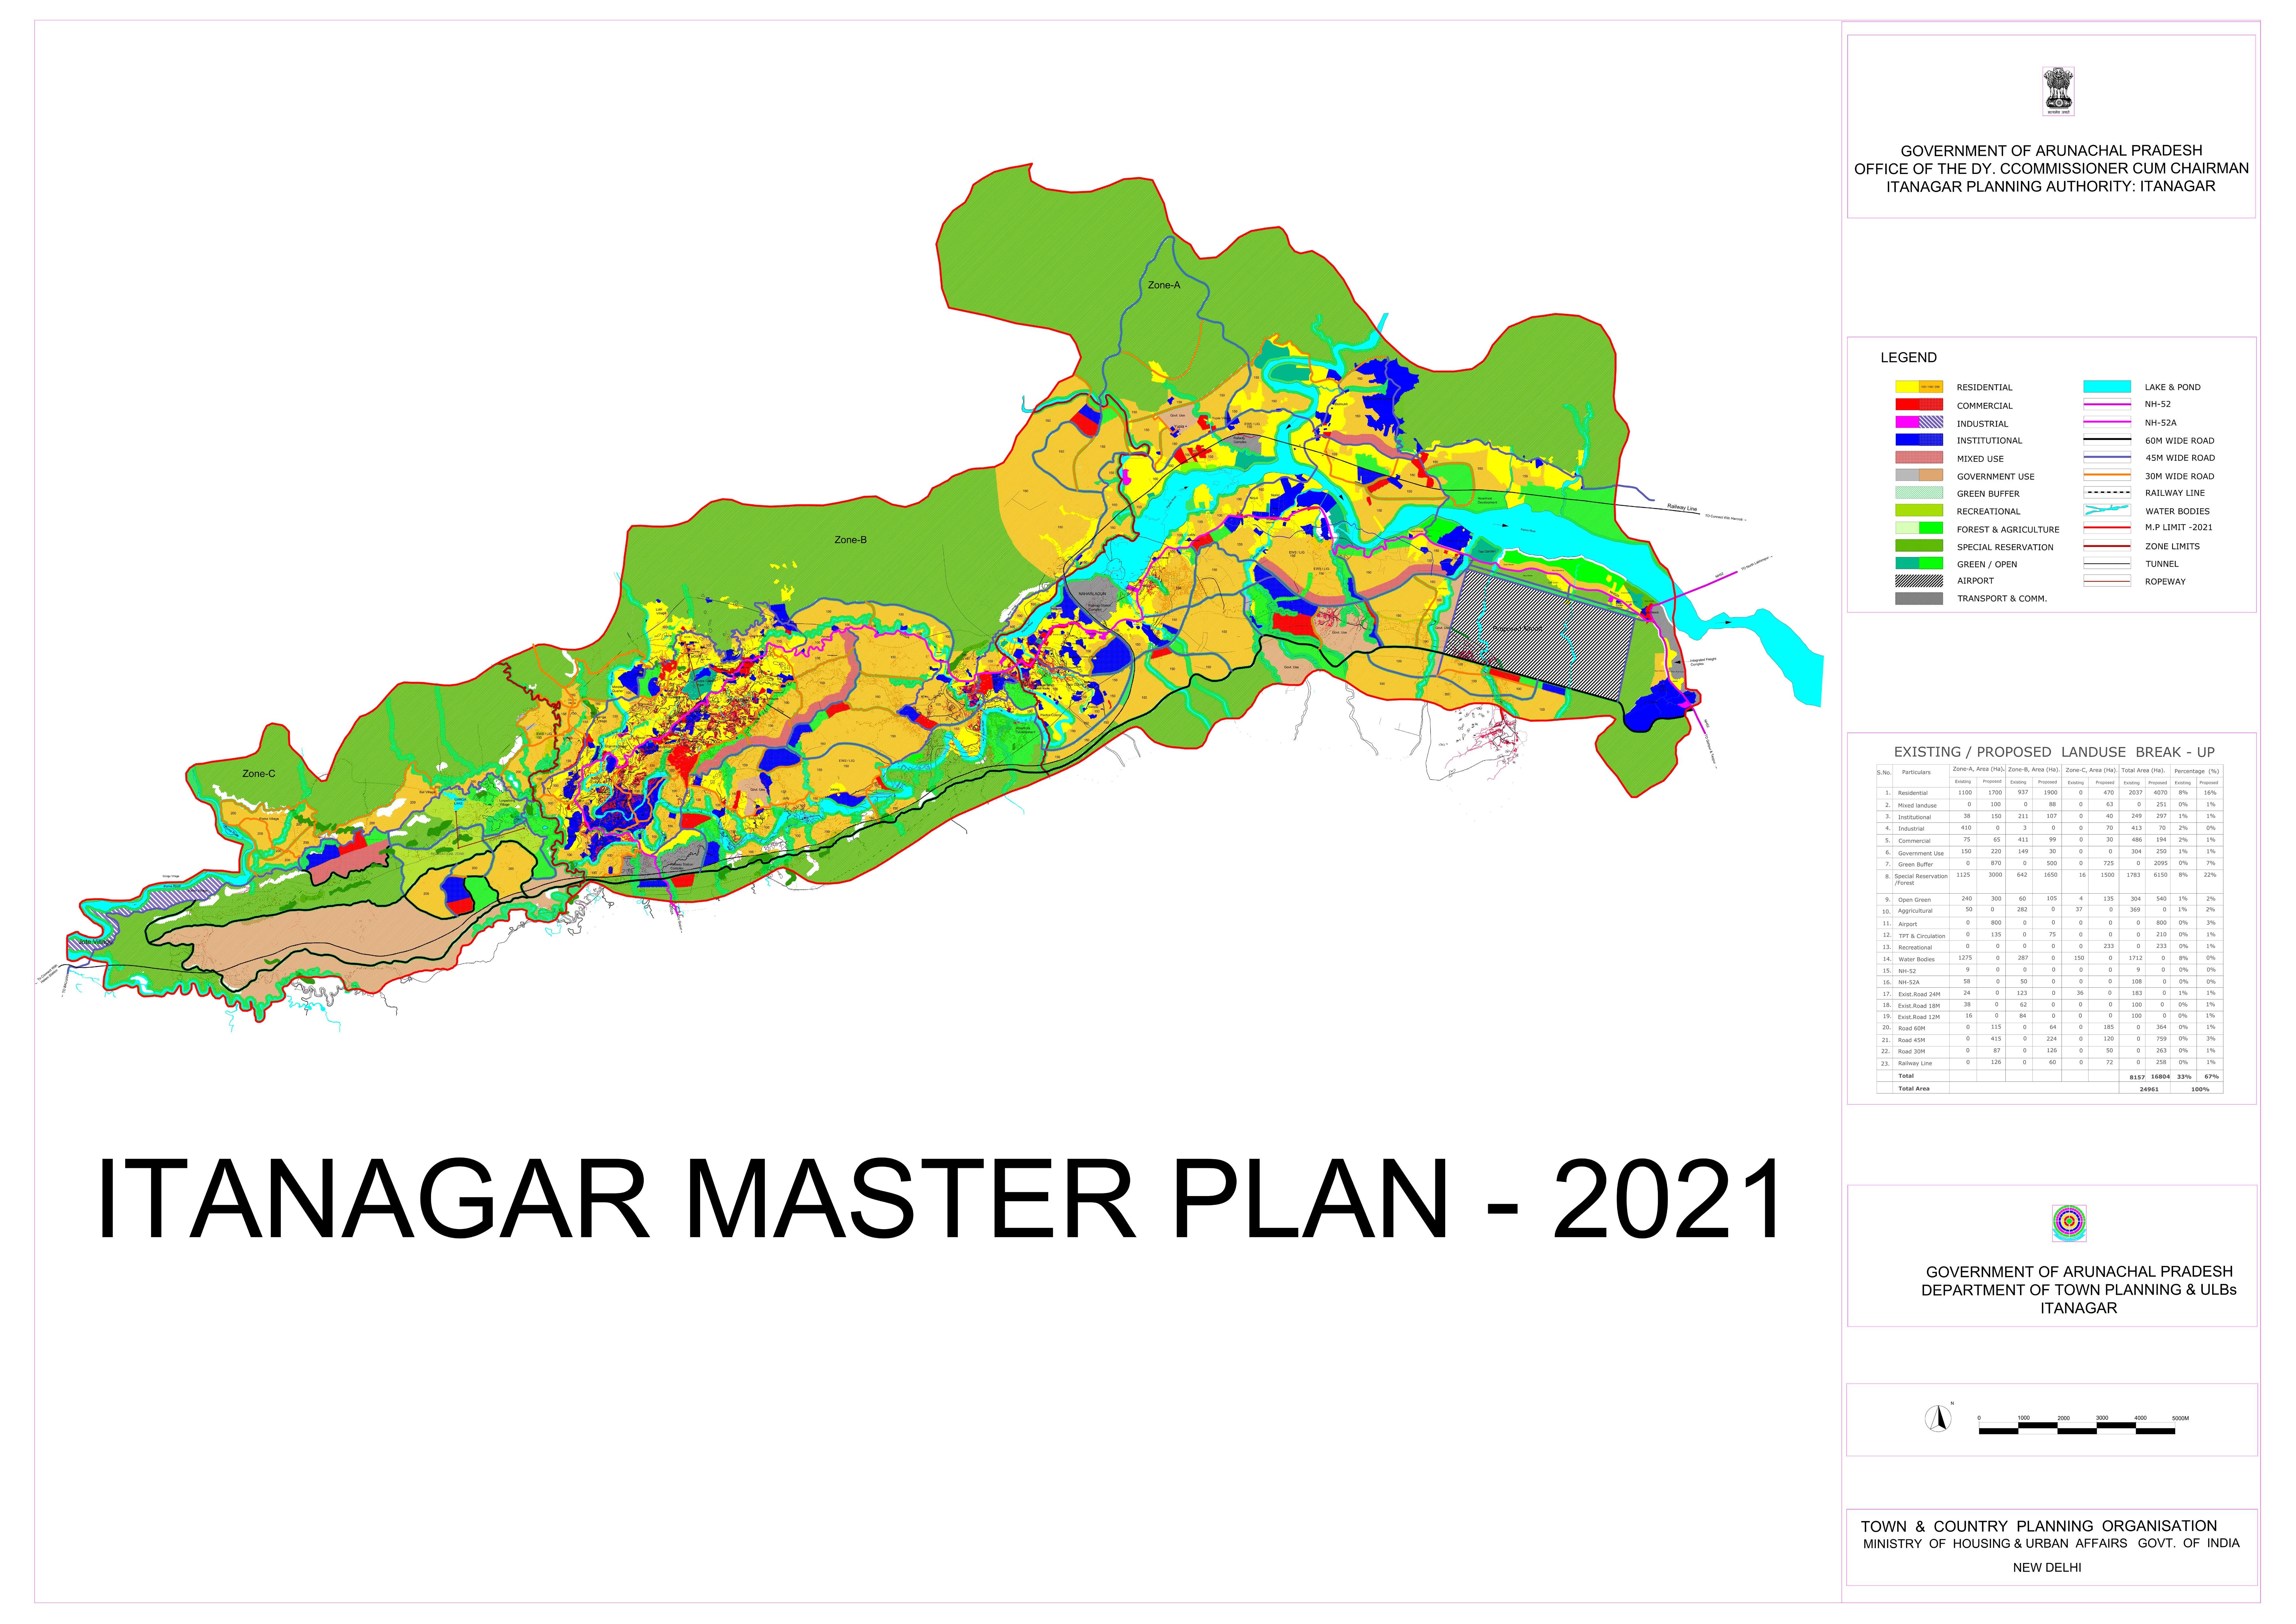 Itanagar Master Plan